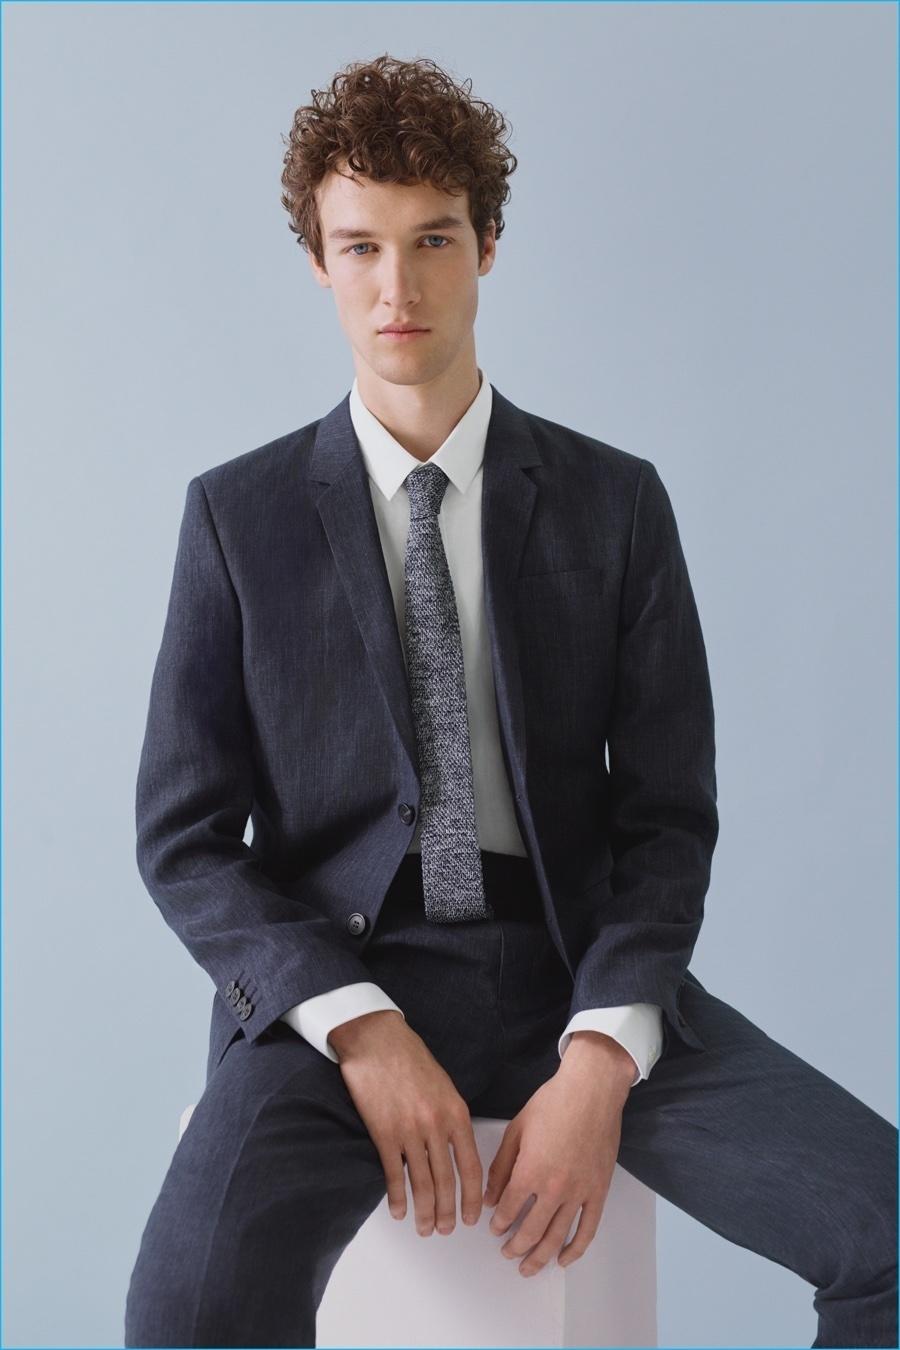 Mens Navy Suit White Dress Shirt Grey Knit Tie Mens Fashion